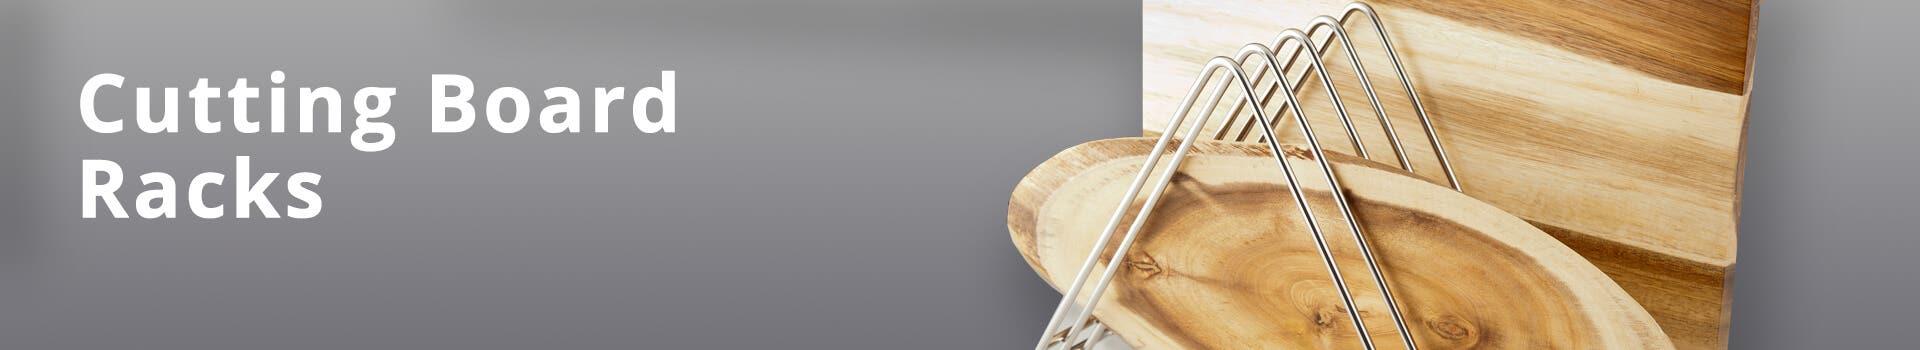 Stainless Steel Cutting Board Racks